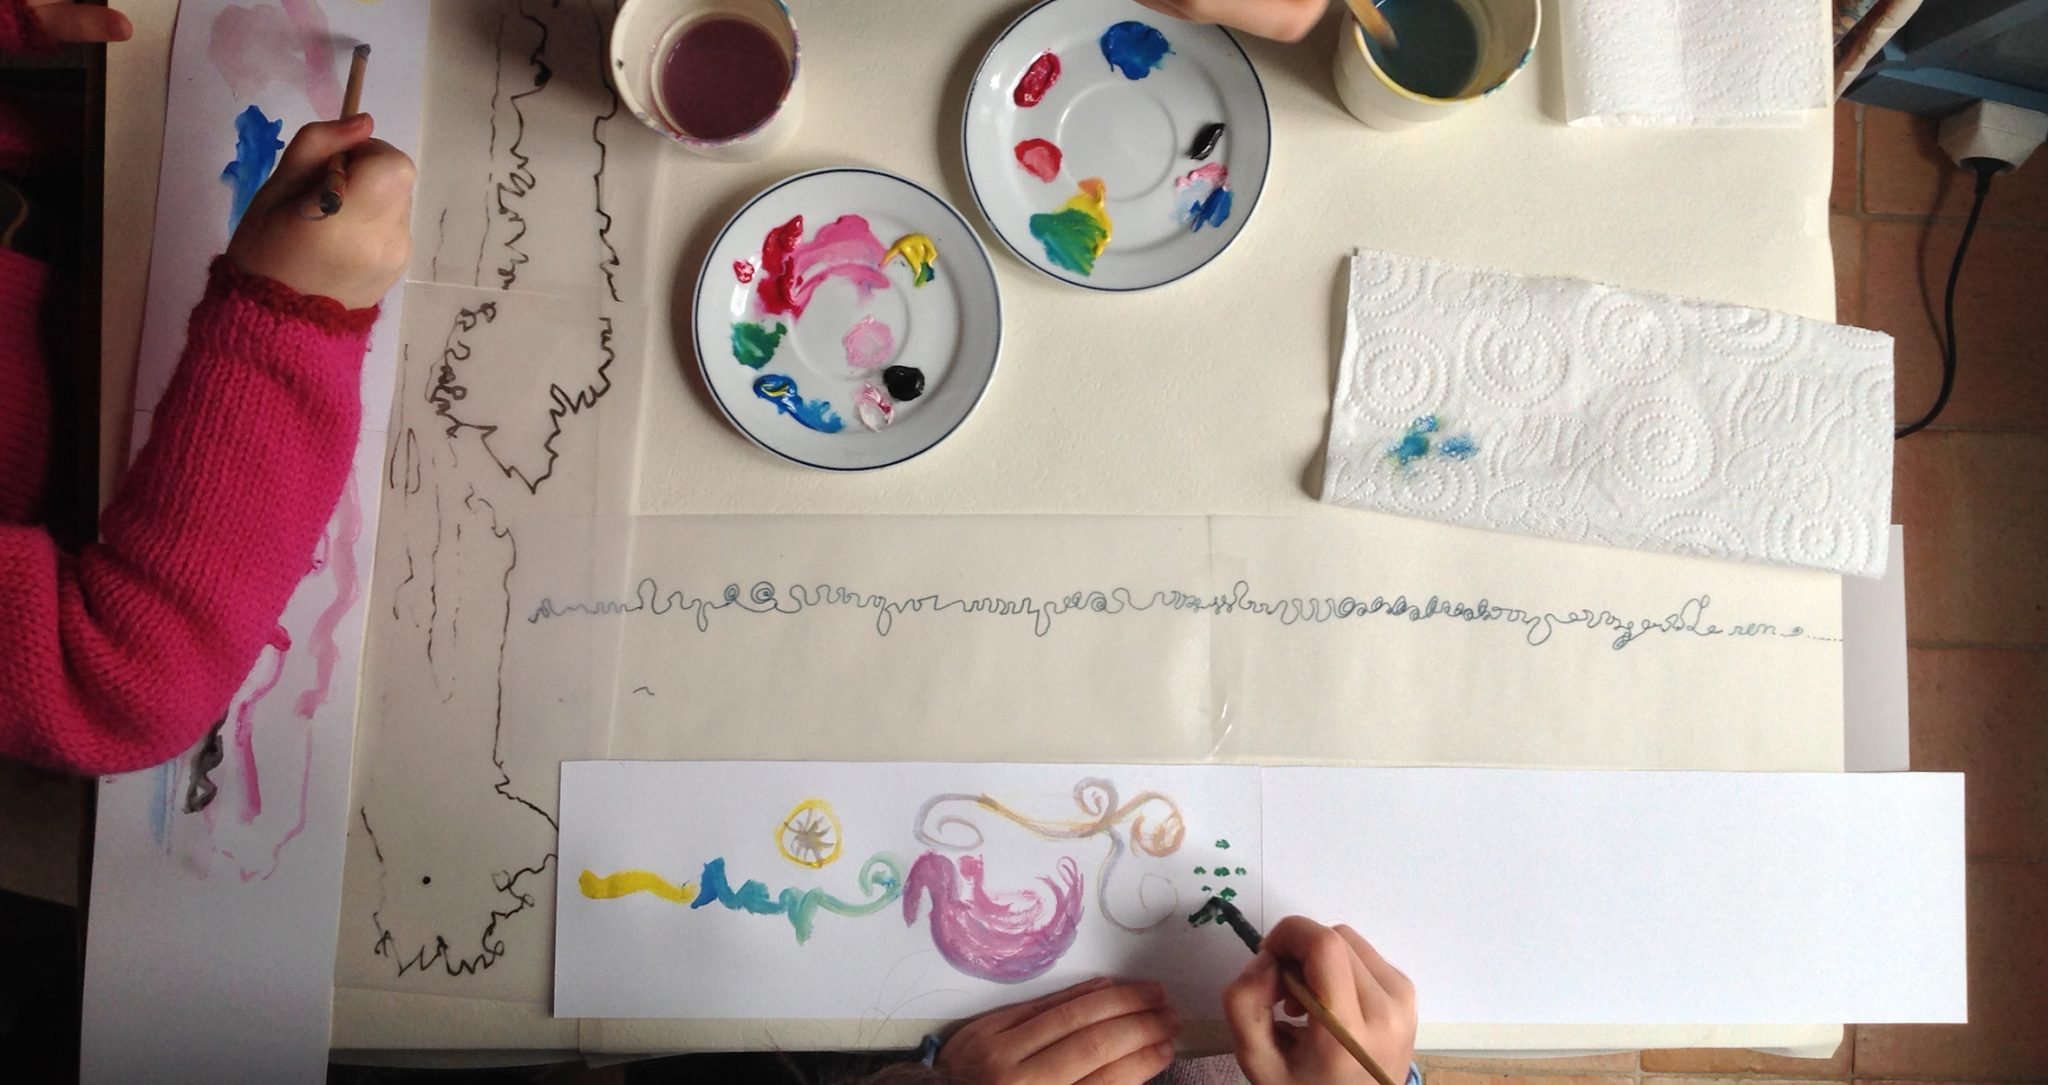 Atelier Klee